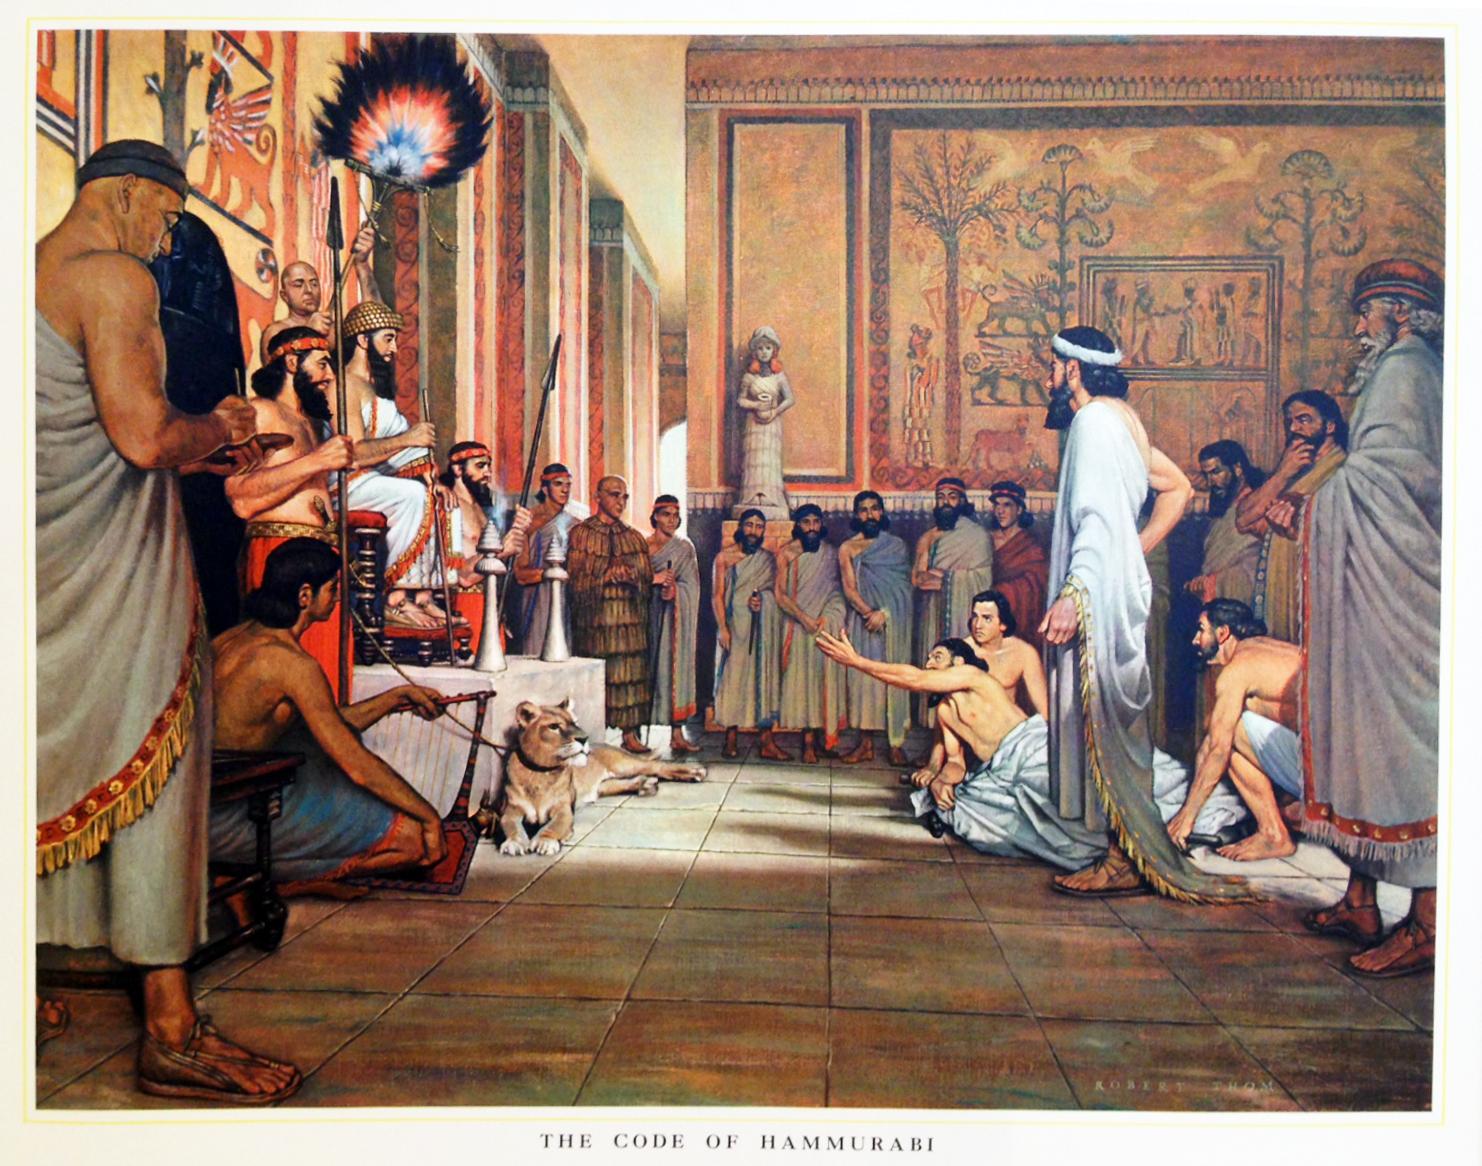 HOM - The Code of Hammurabi - Trowbridge Gallery